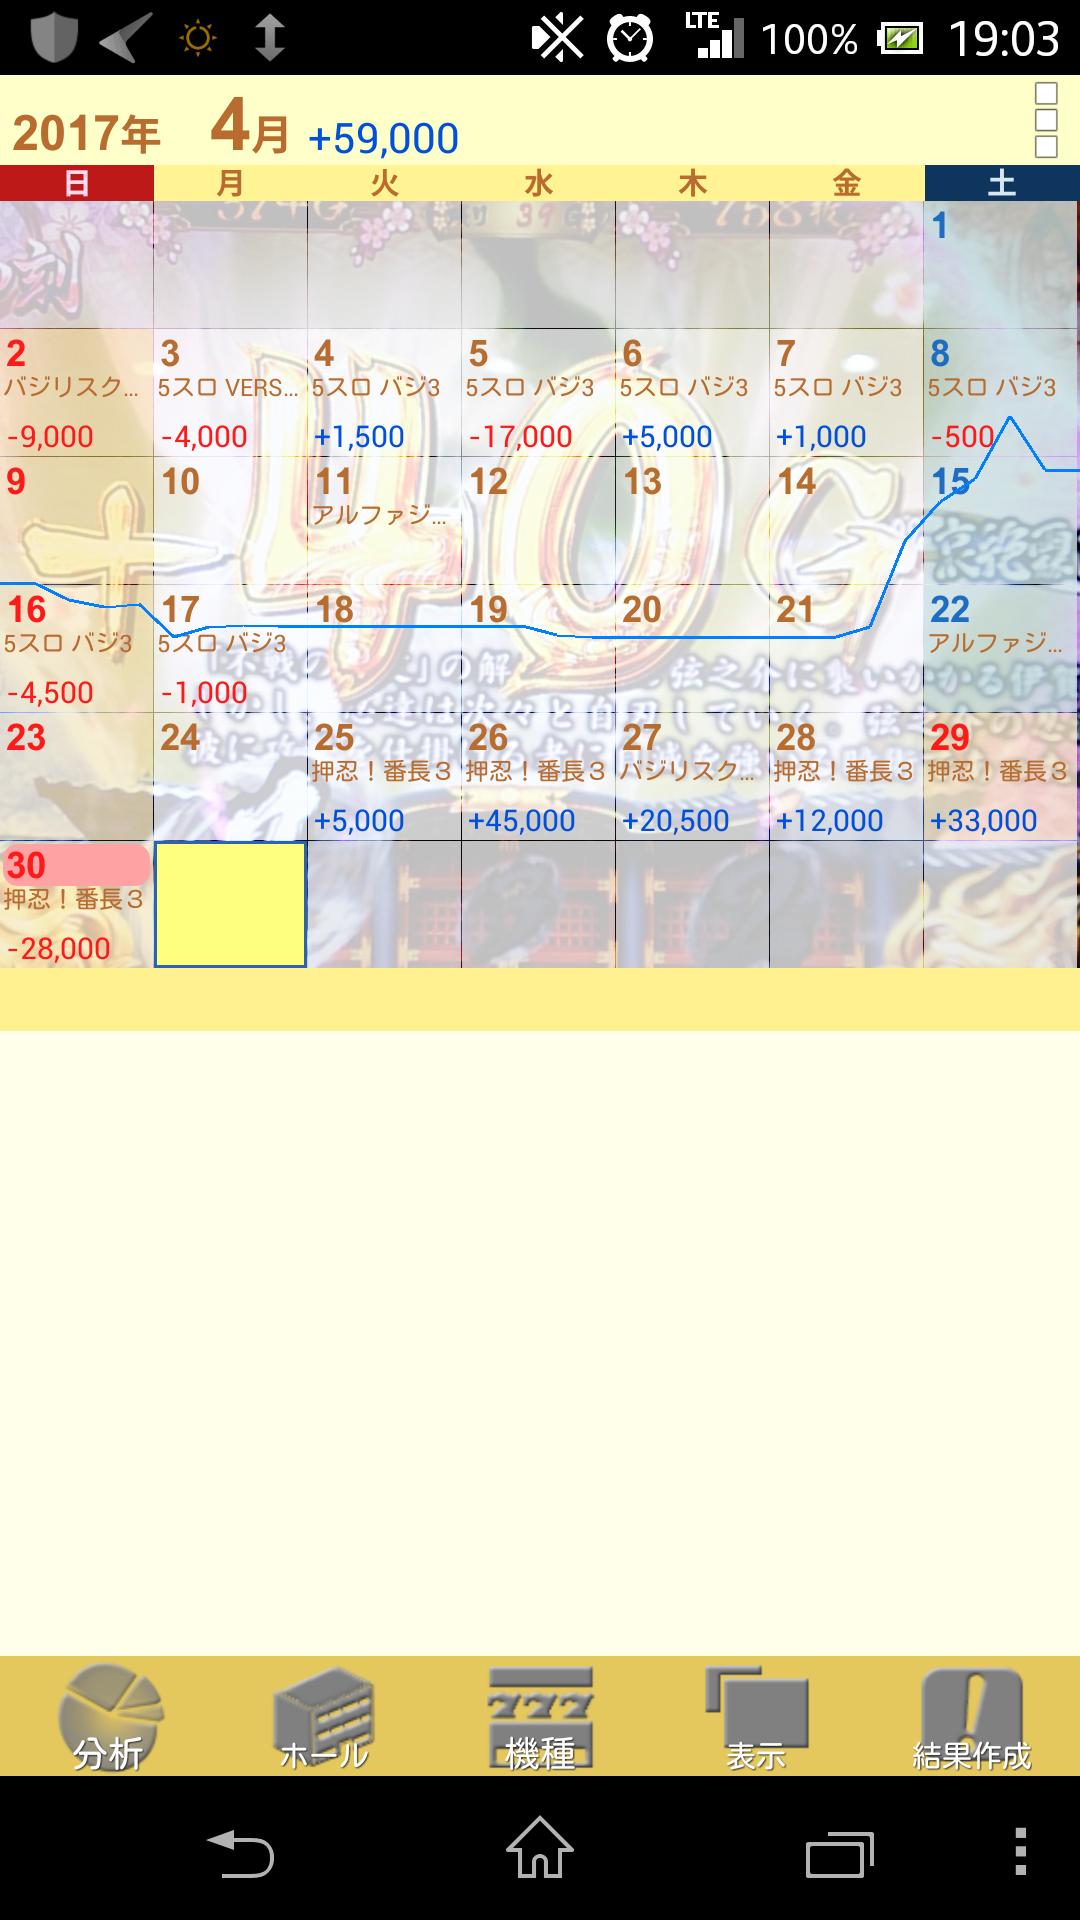 Screenshot_2017-04-30-19-03-49.png